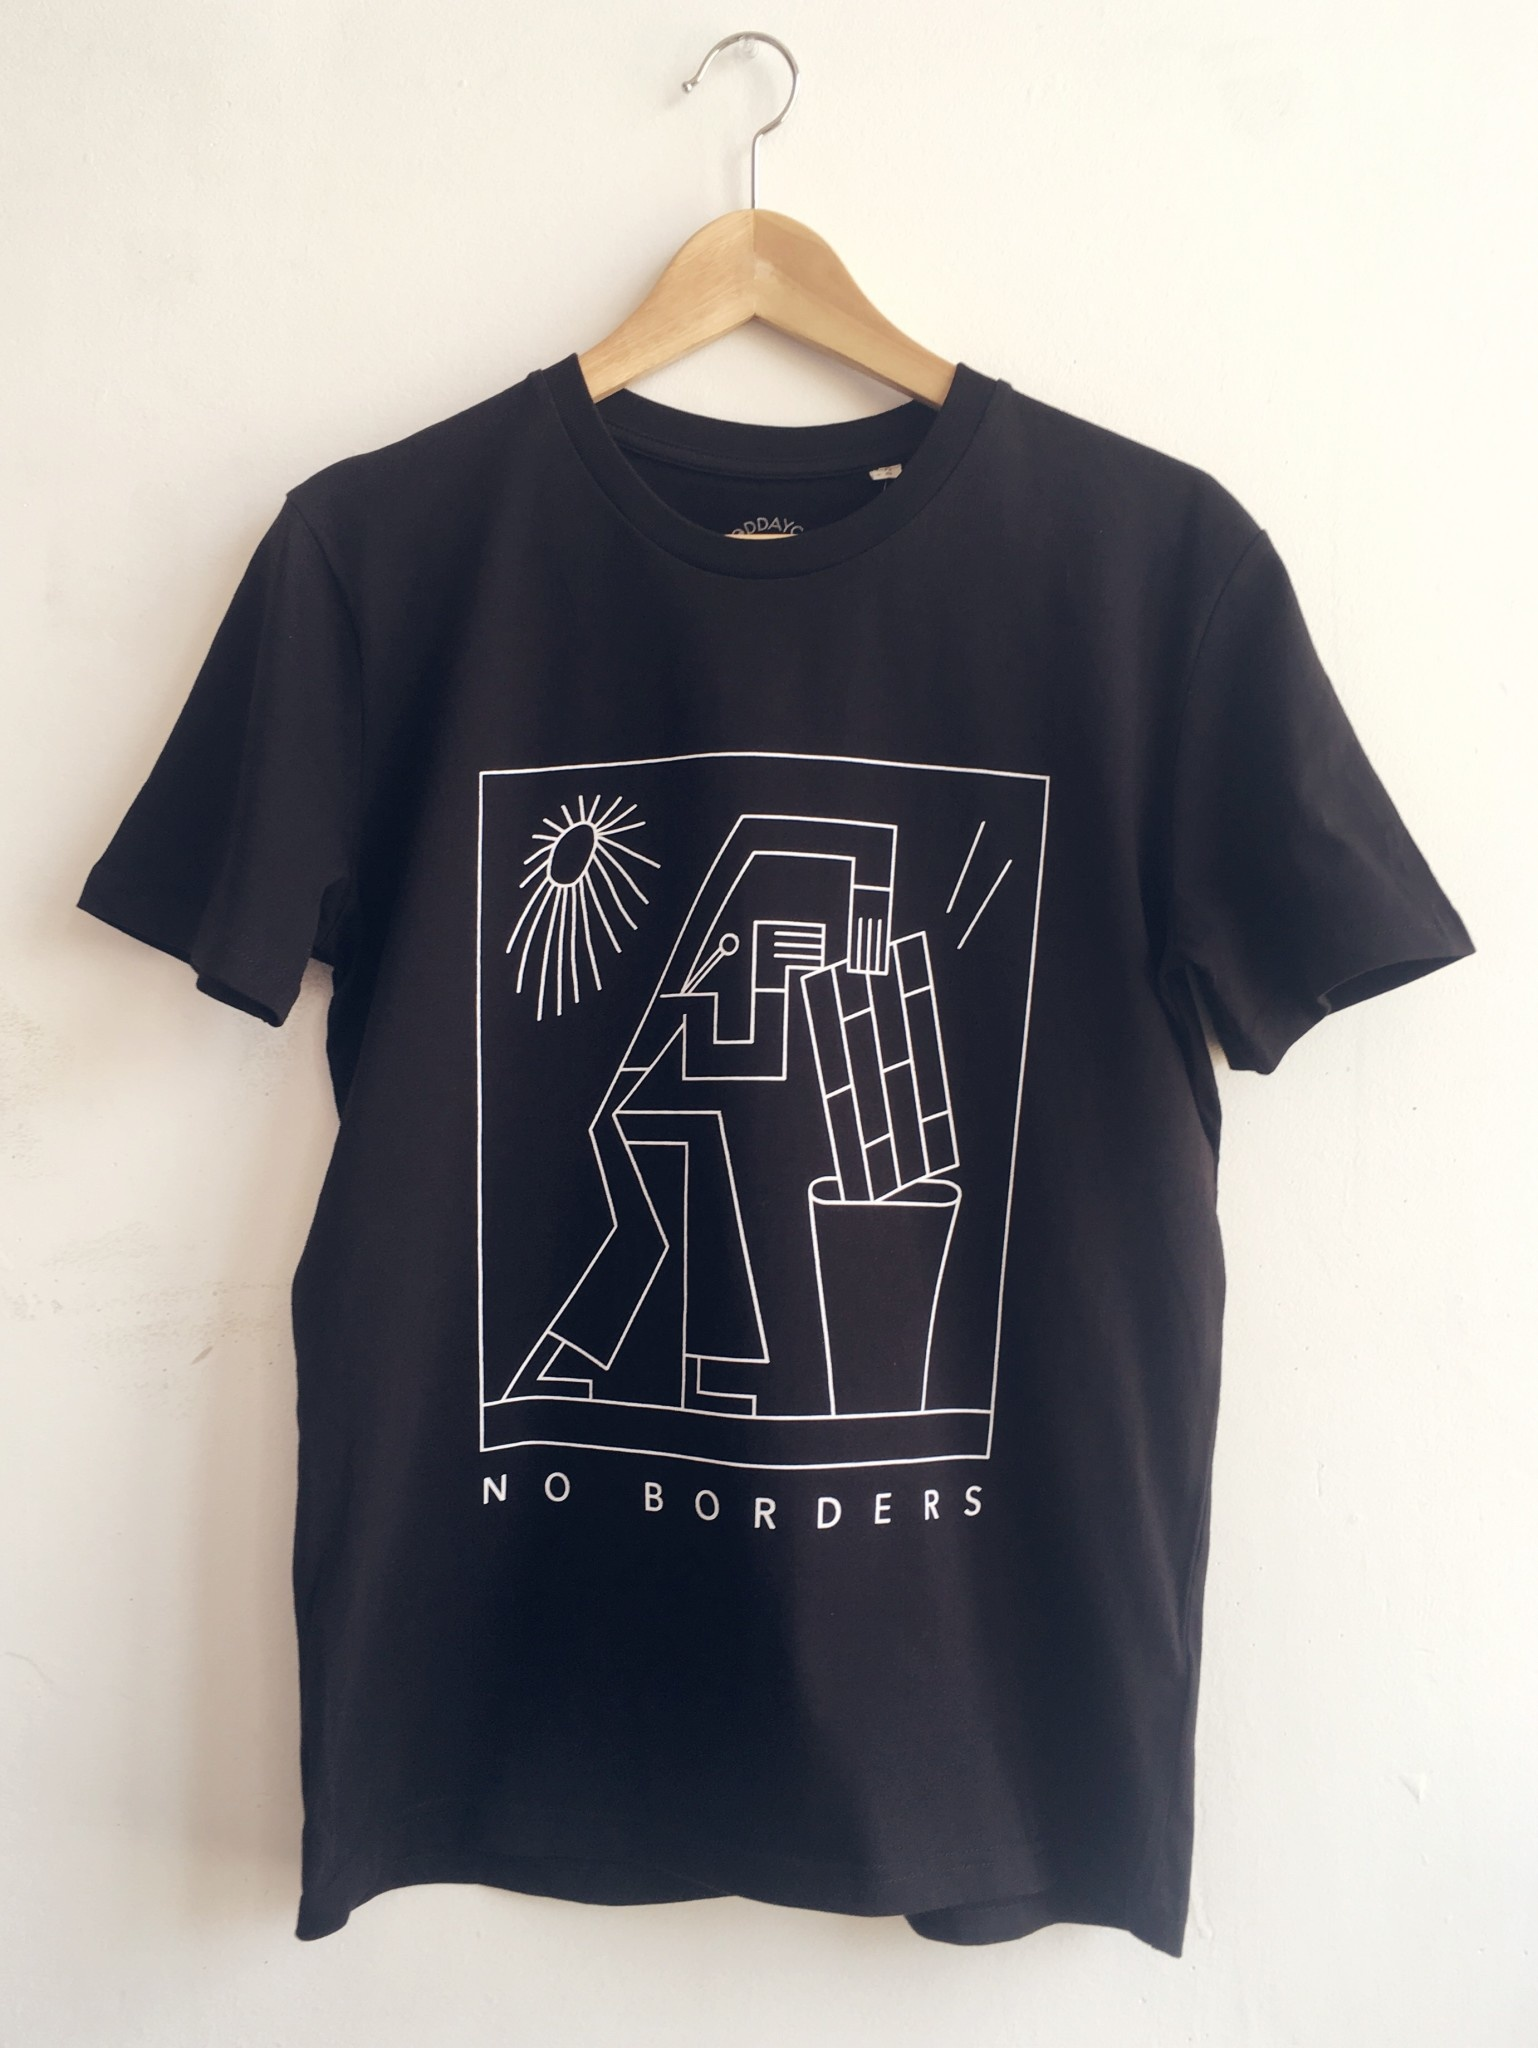 Good Day Club No Borders T-shirt